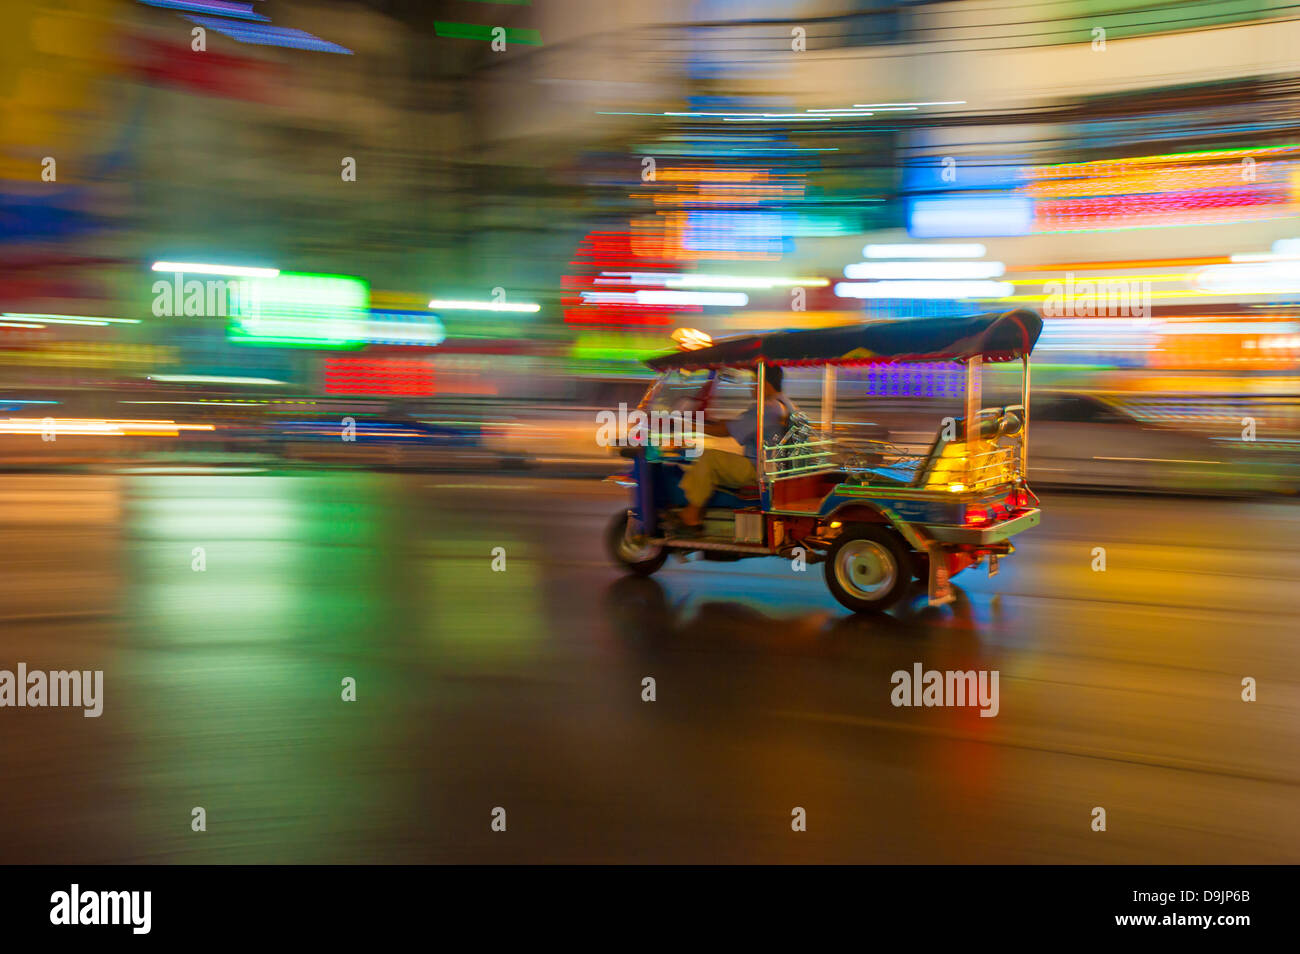 Tuk-tuk in motion blur, Bangkok, Thaïlande Photo Stock